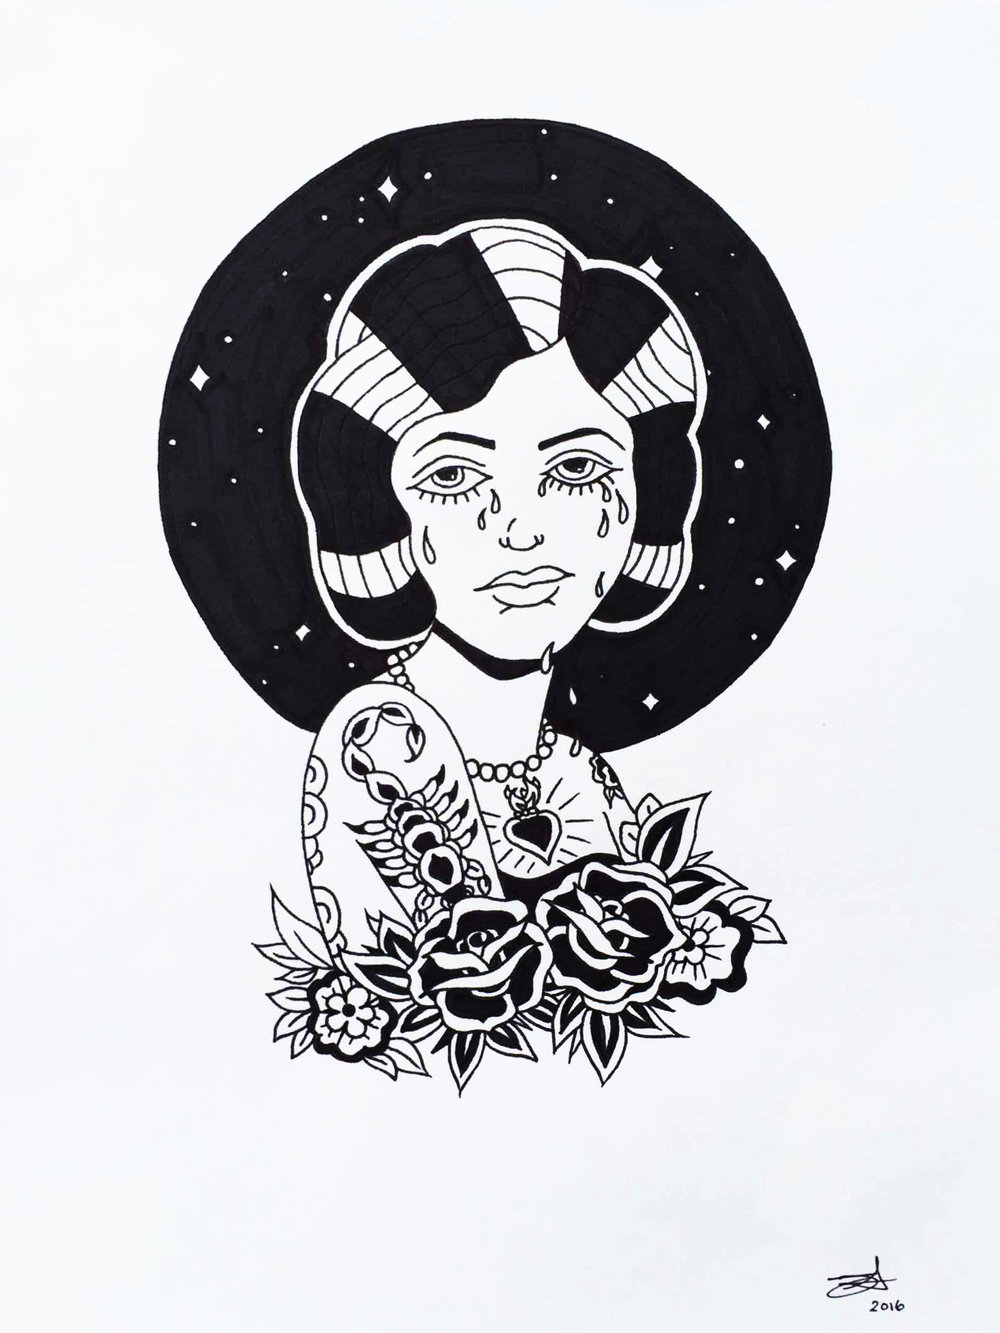 studiojeffrey_illustration_cry